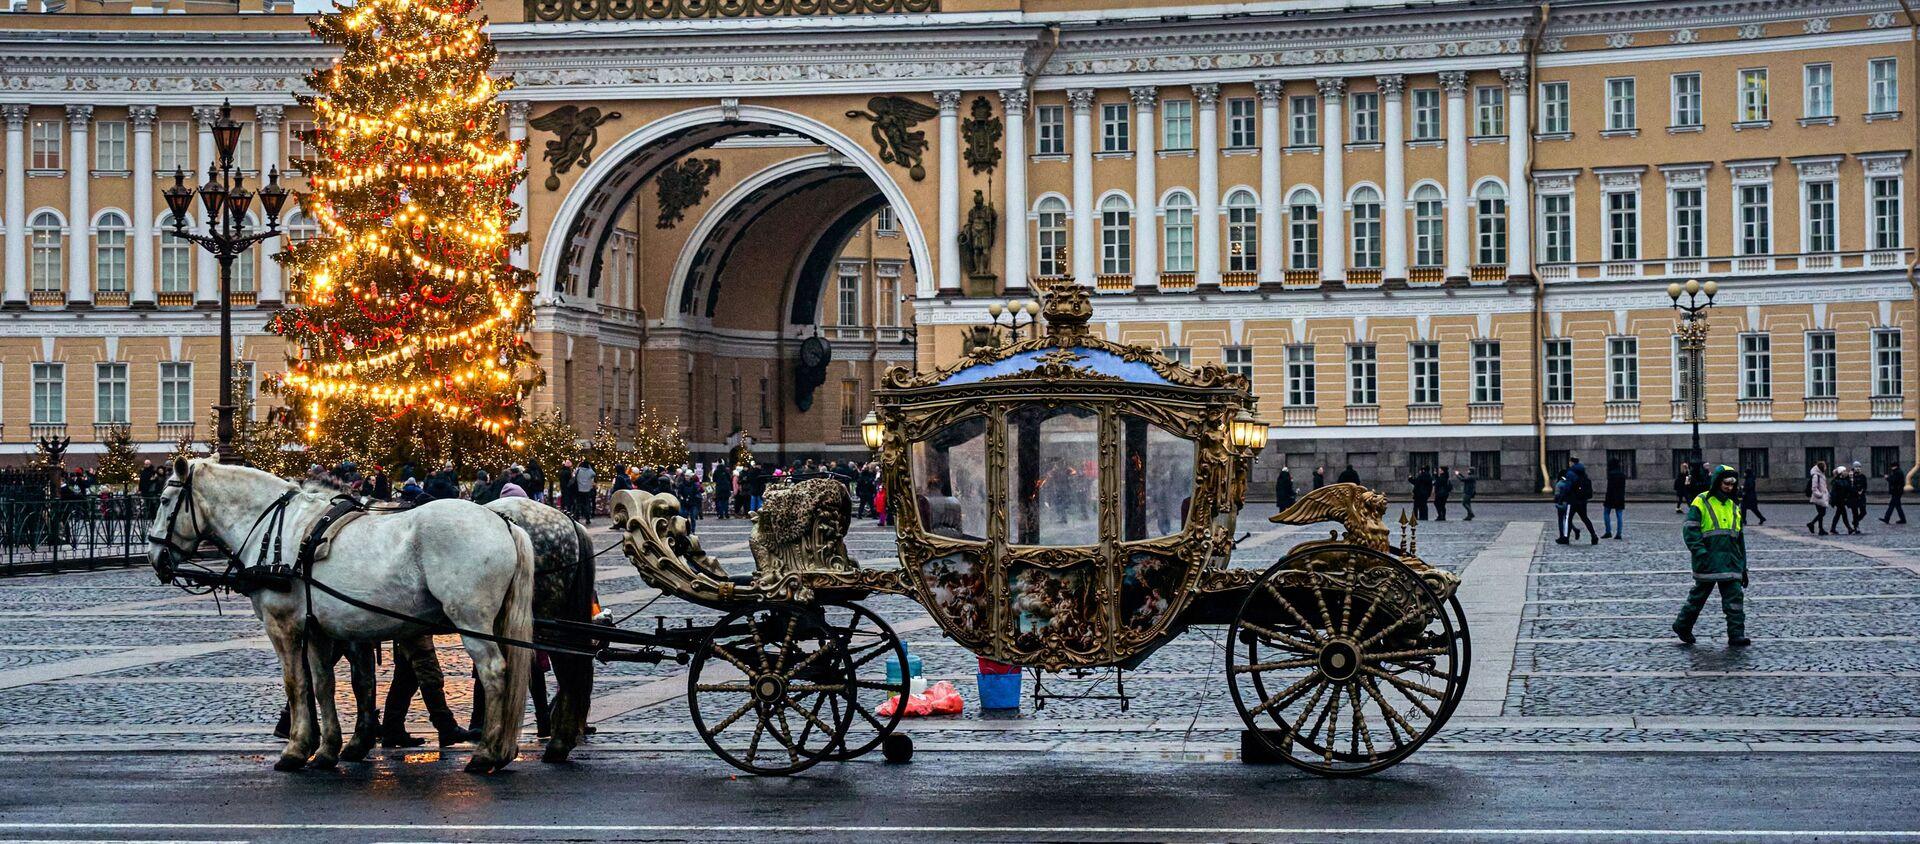 Un carruaje en San Petersburgo (imagen referencial) - Sputnik Mundo, 1920, 05.01.2021